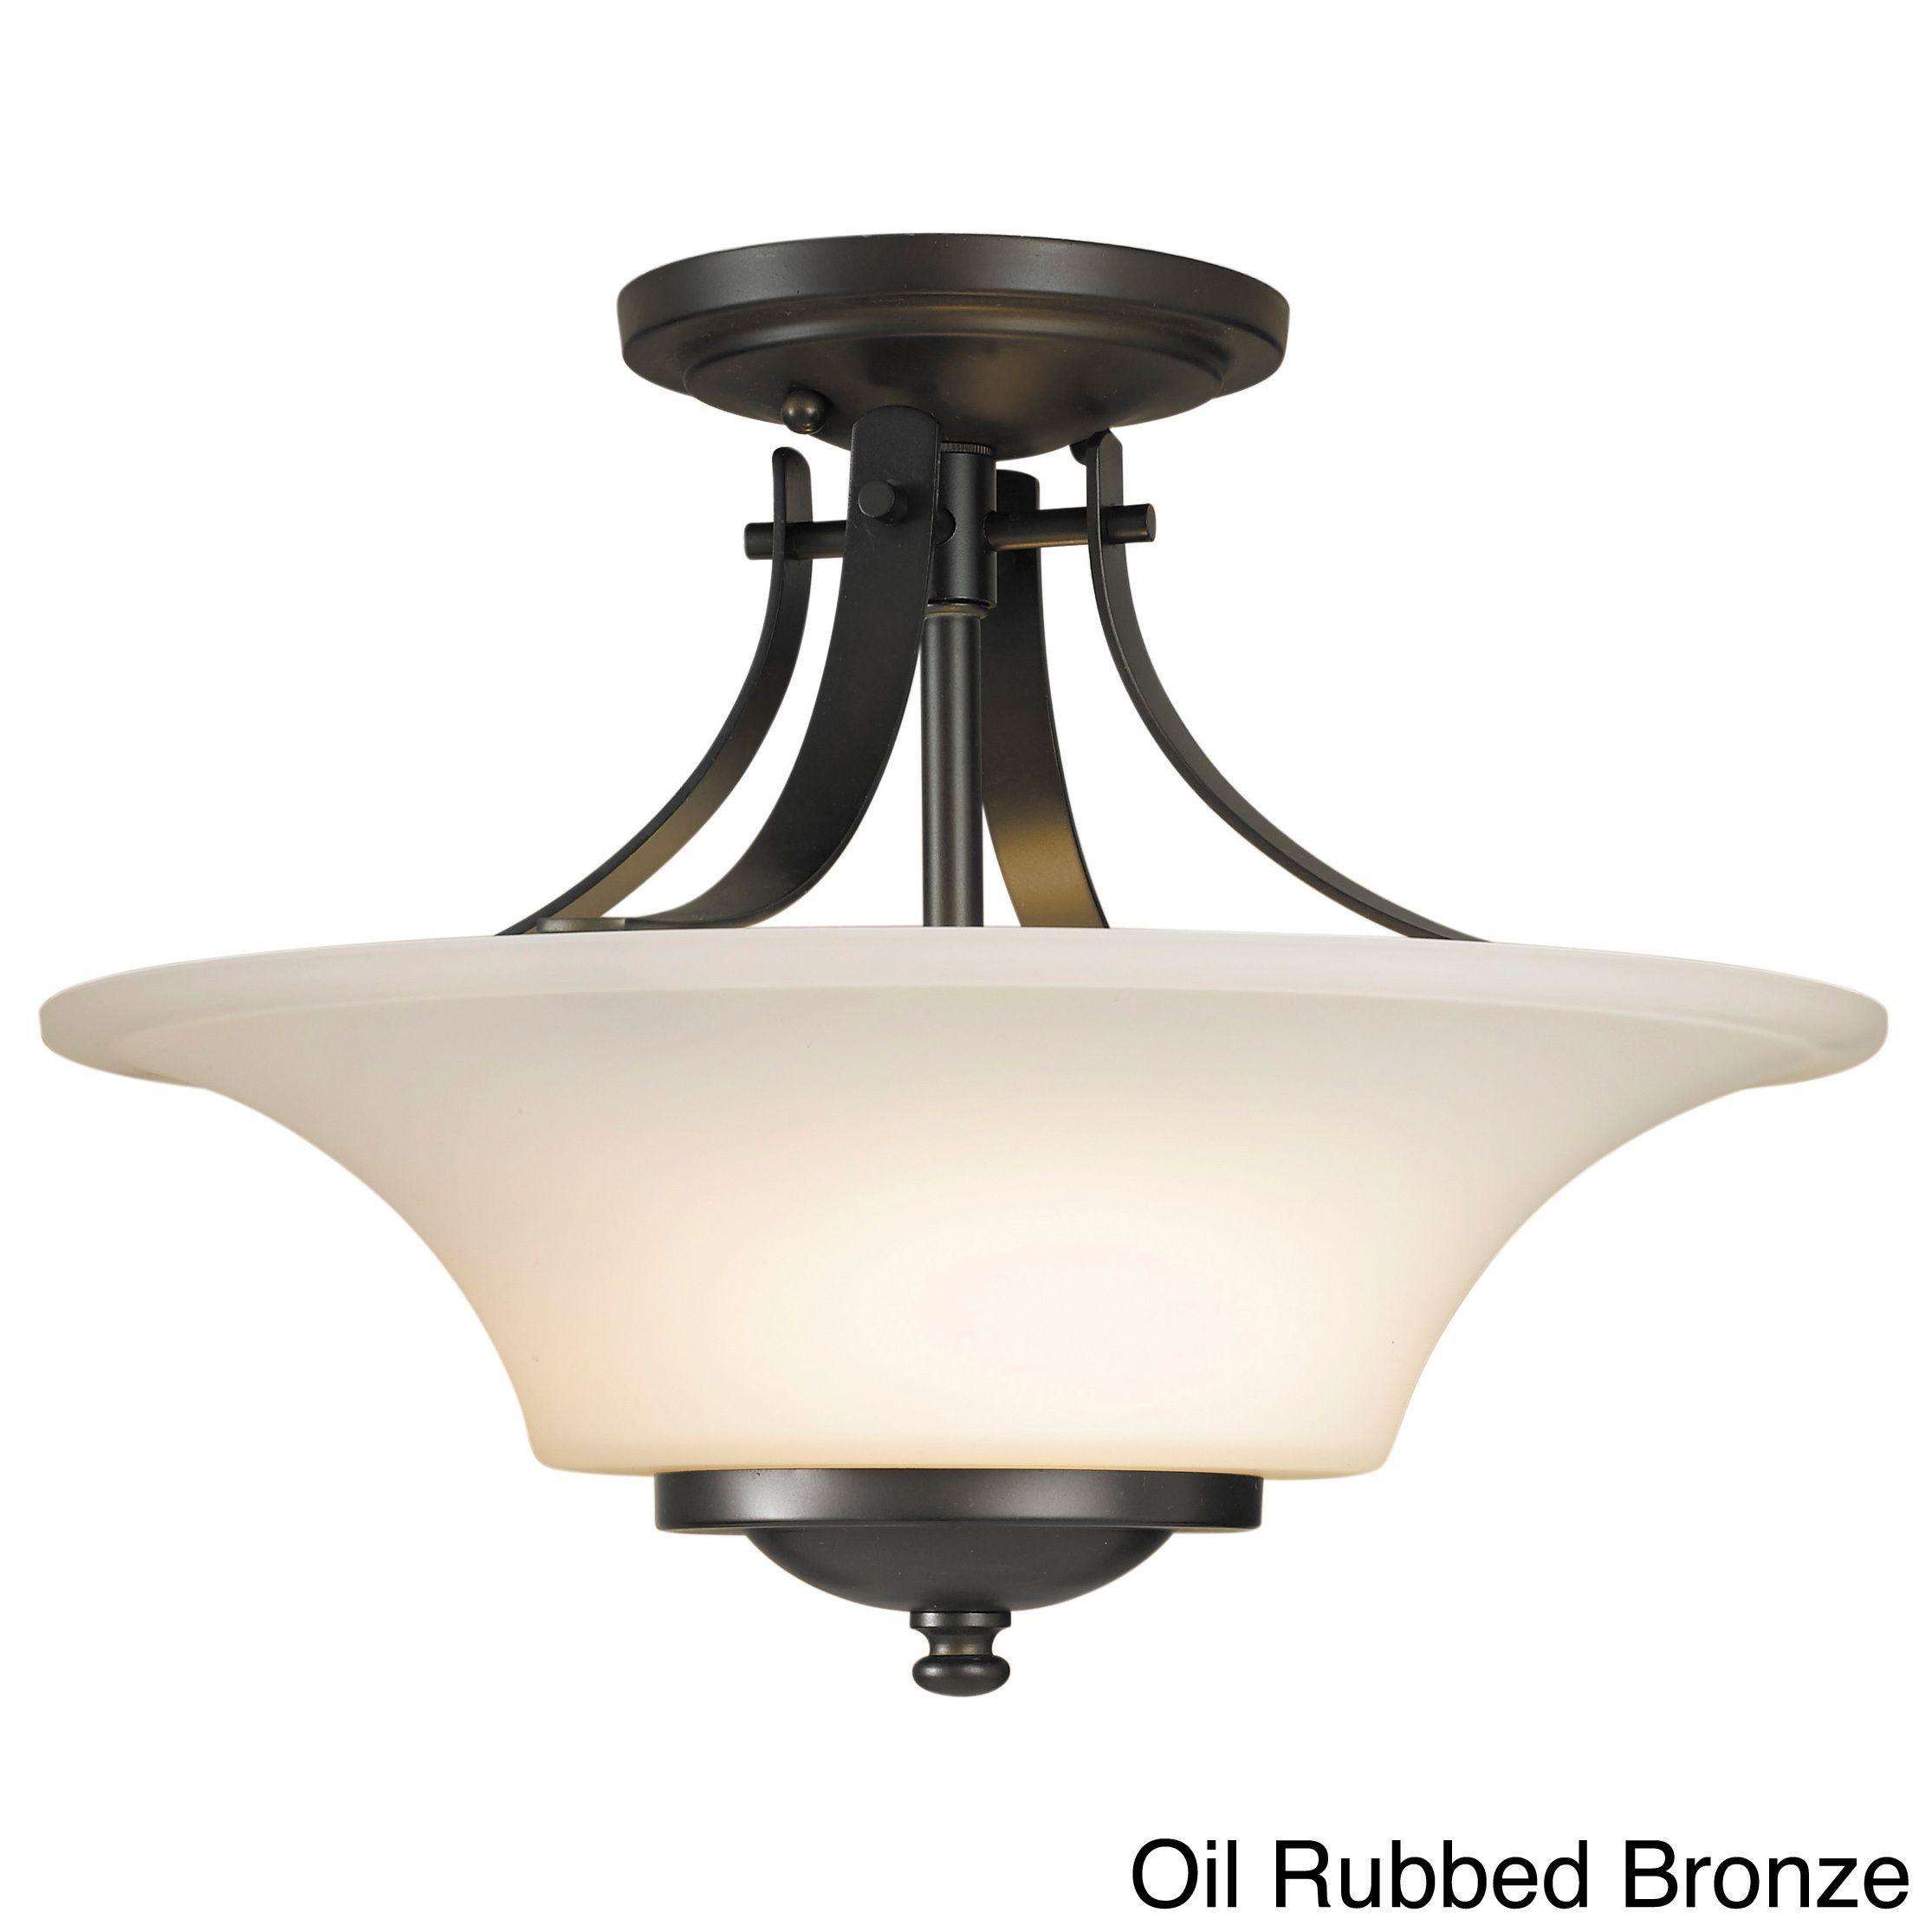 Feiss barrington 2 light indoor semi flush mount brushed steel